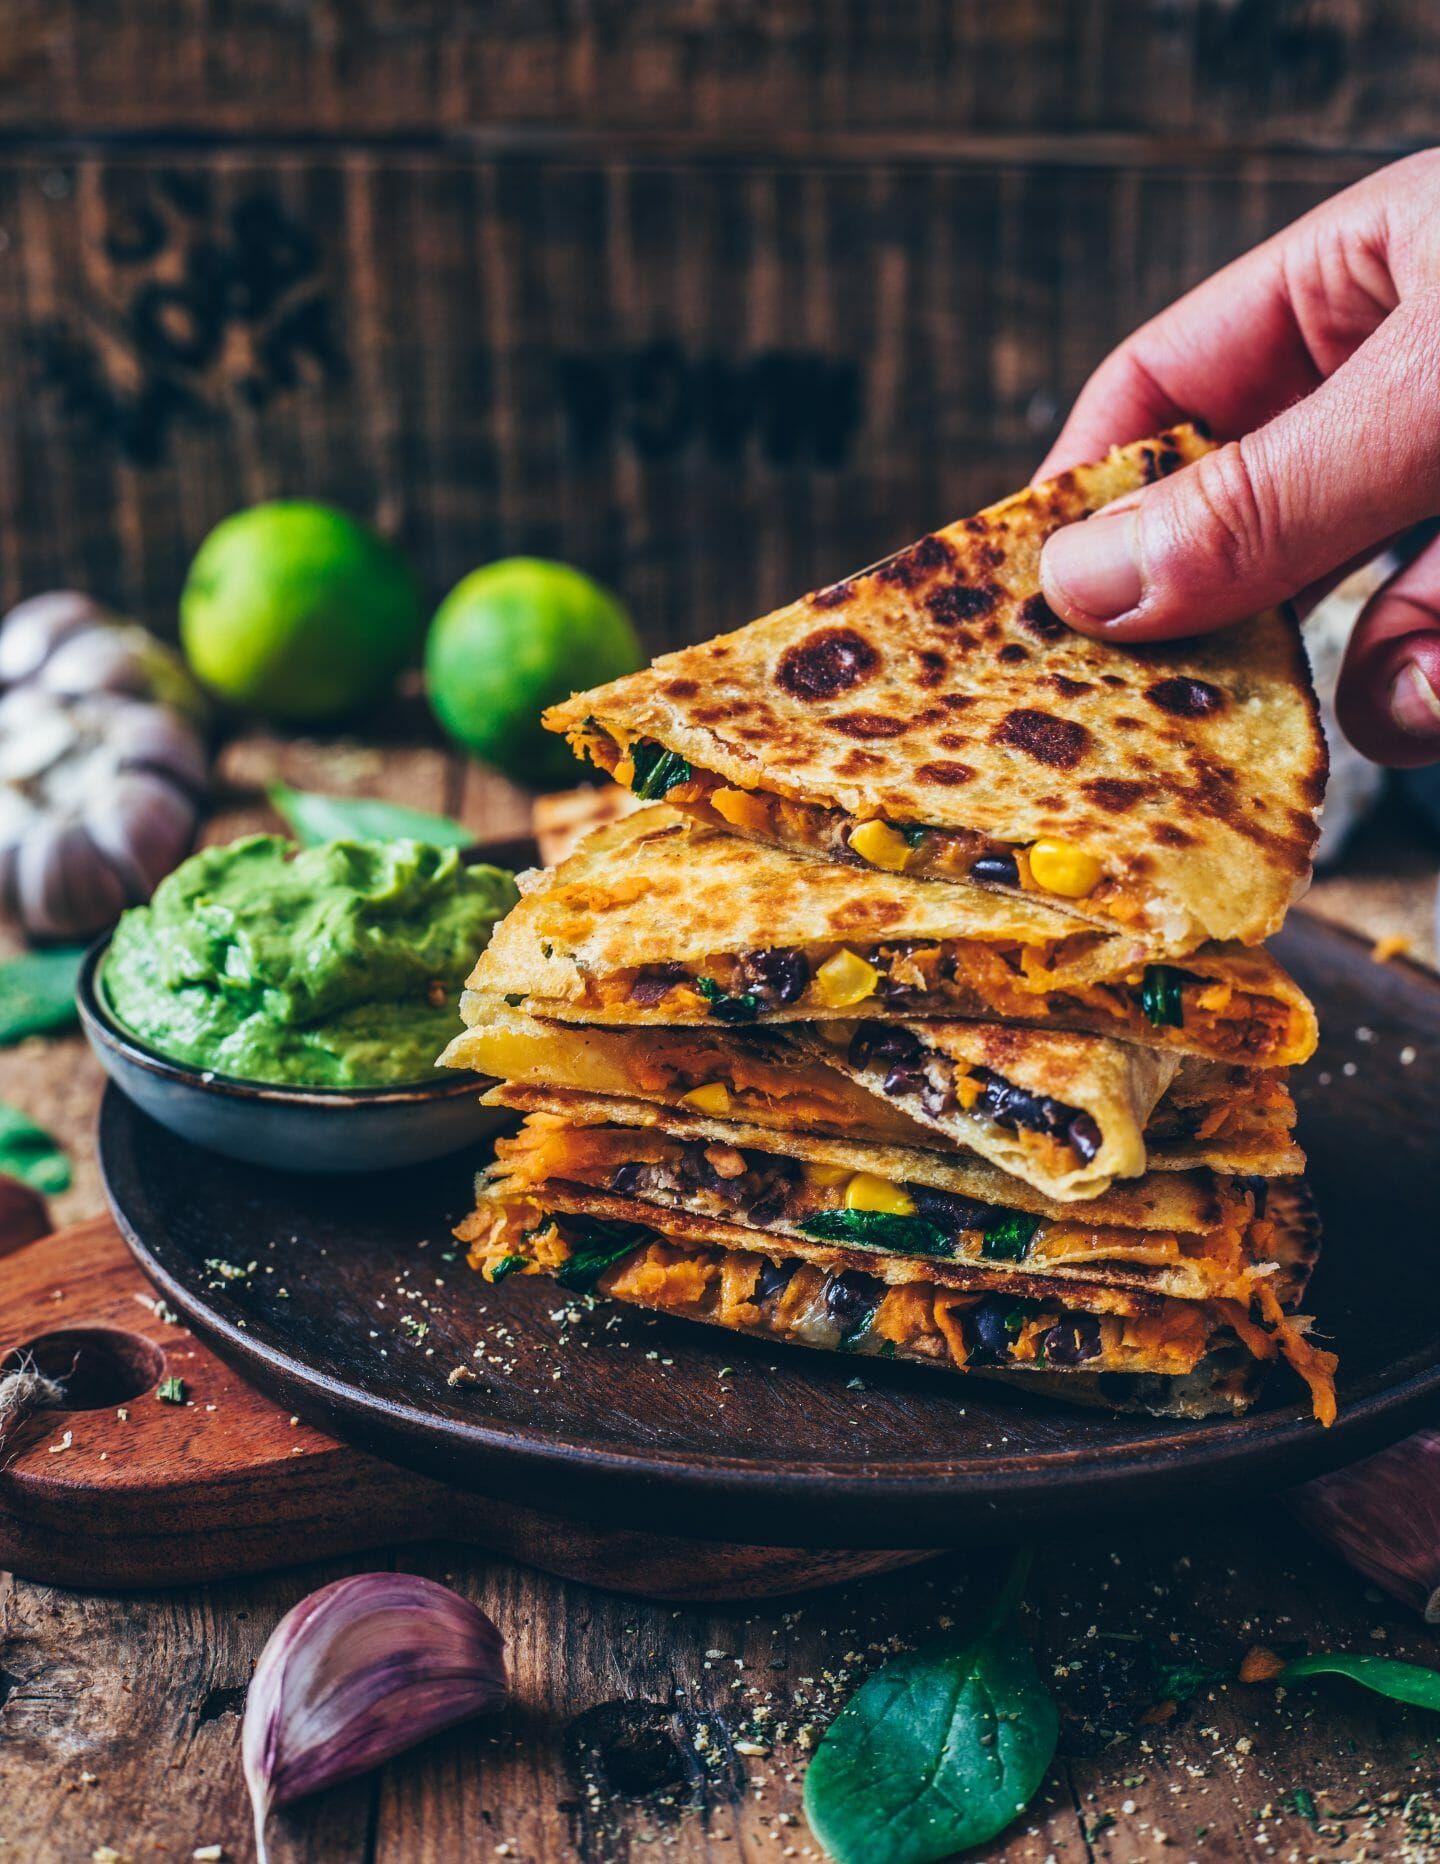 Süßkartoffel-Quesadillas (vegan) - Bianca Zapatka | Rezepte